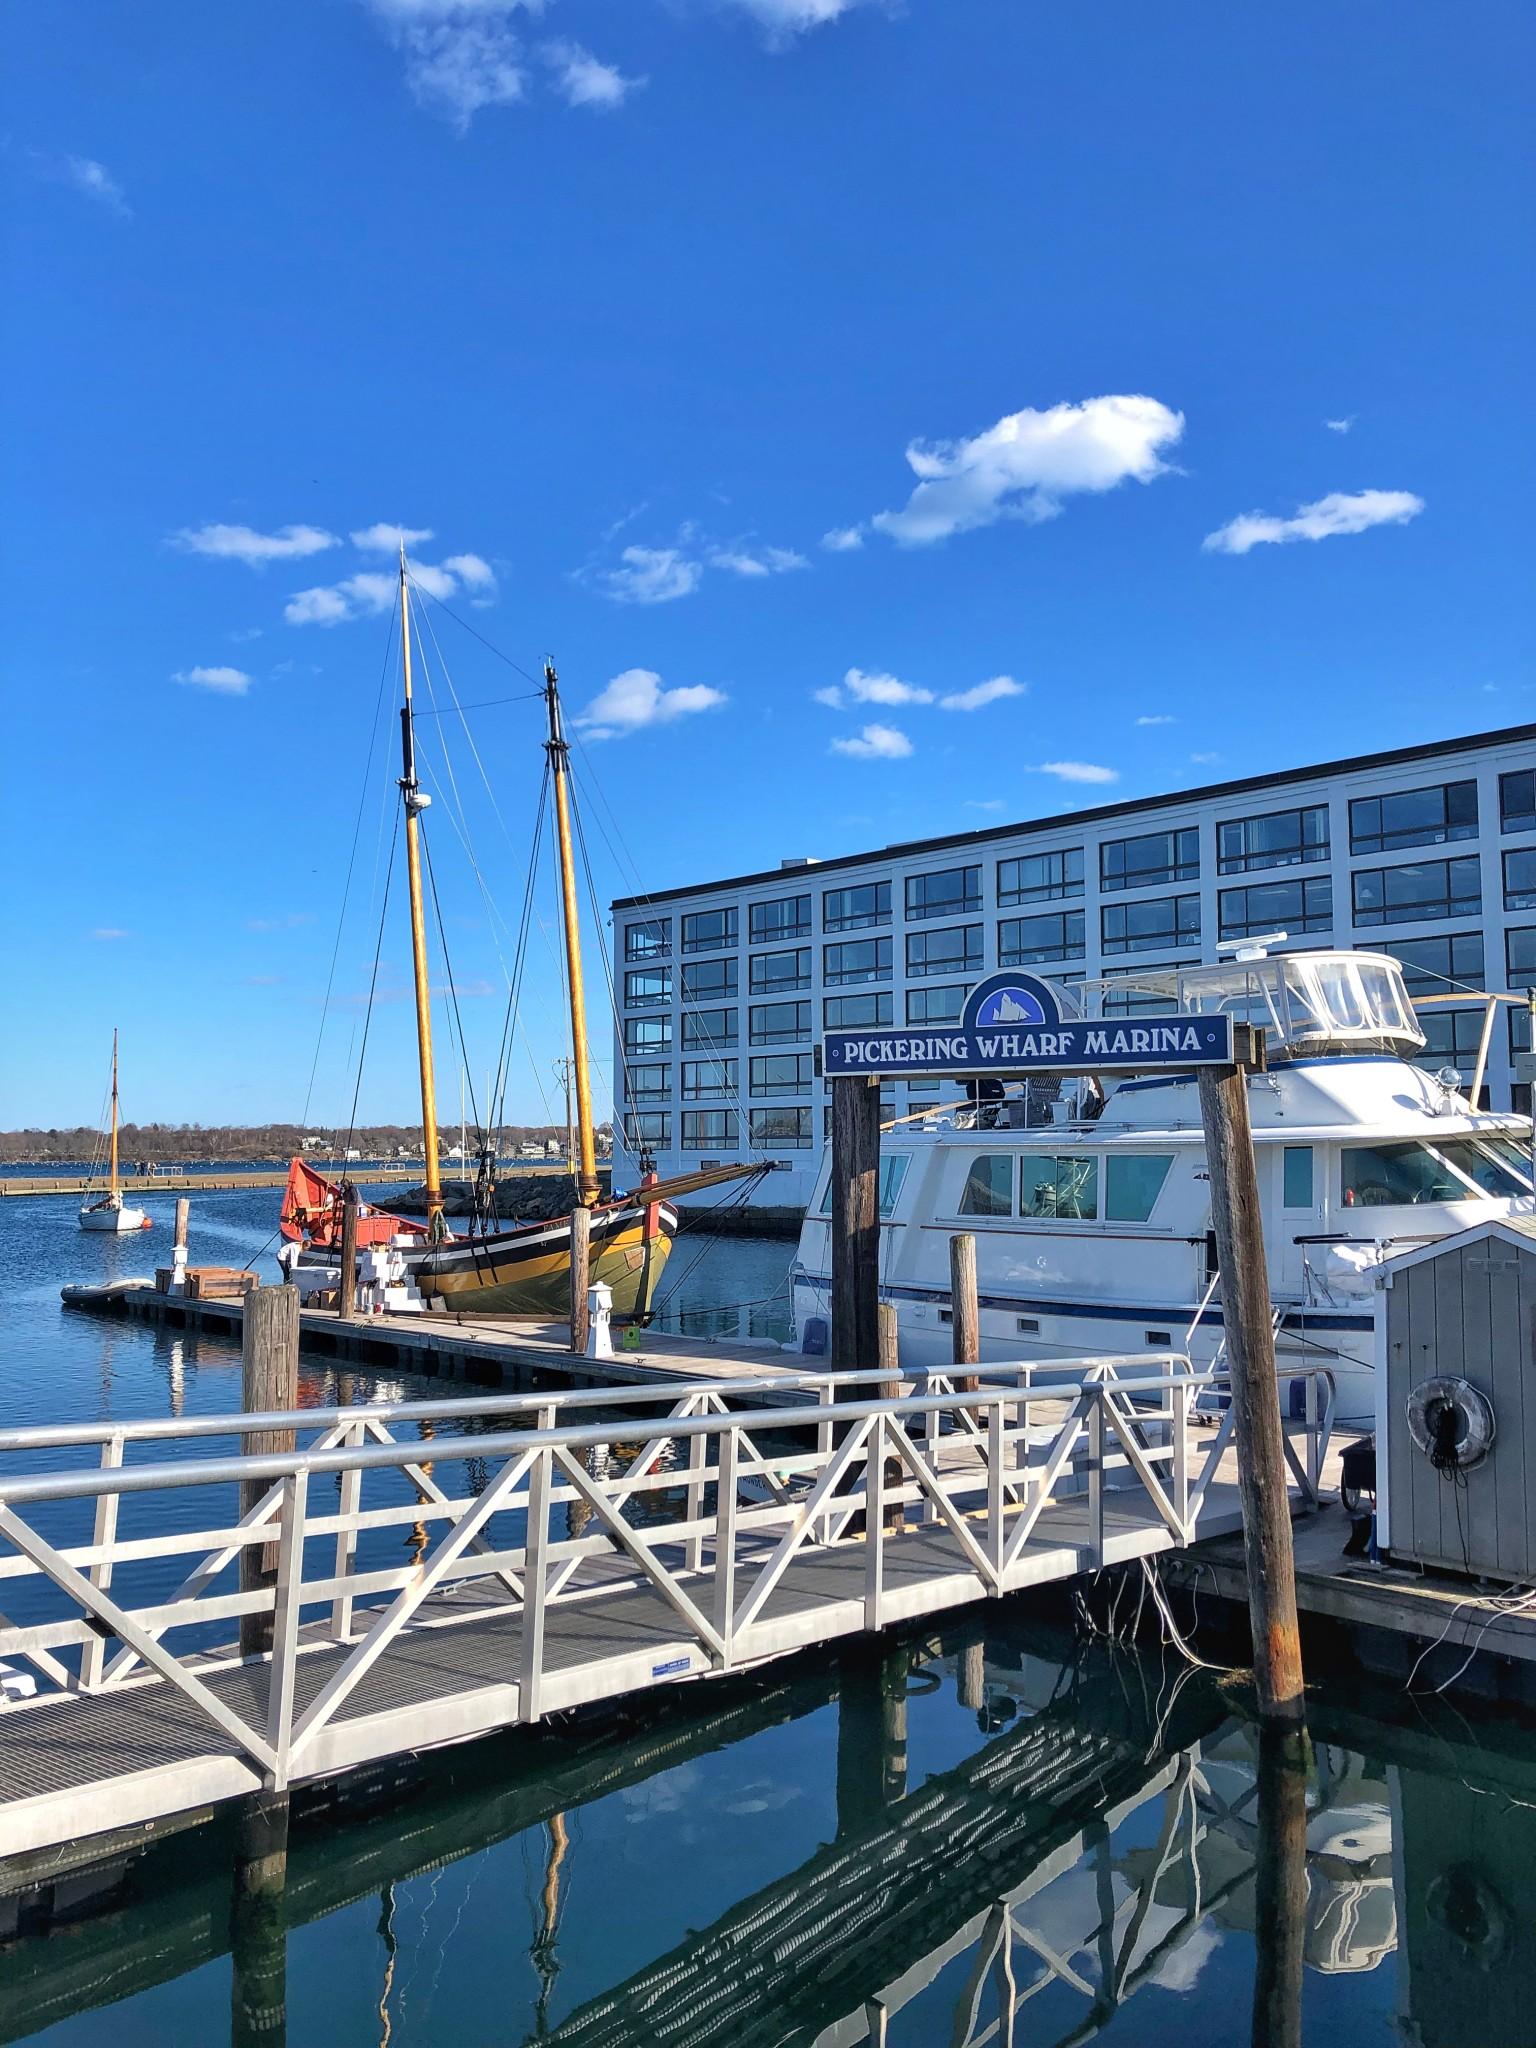 pickering wharf, salem, massachusetts, the-alyst.com